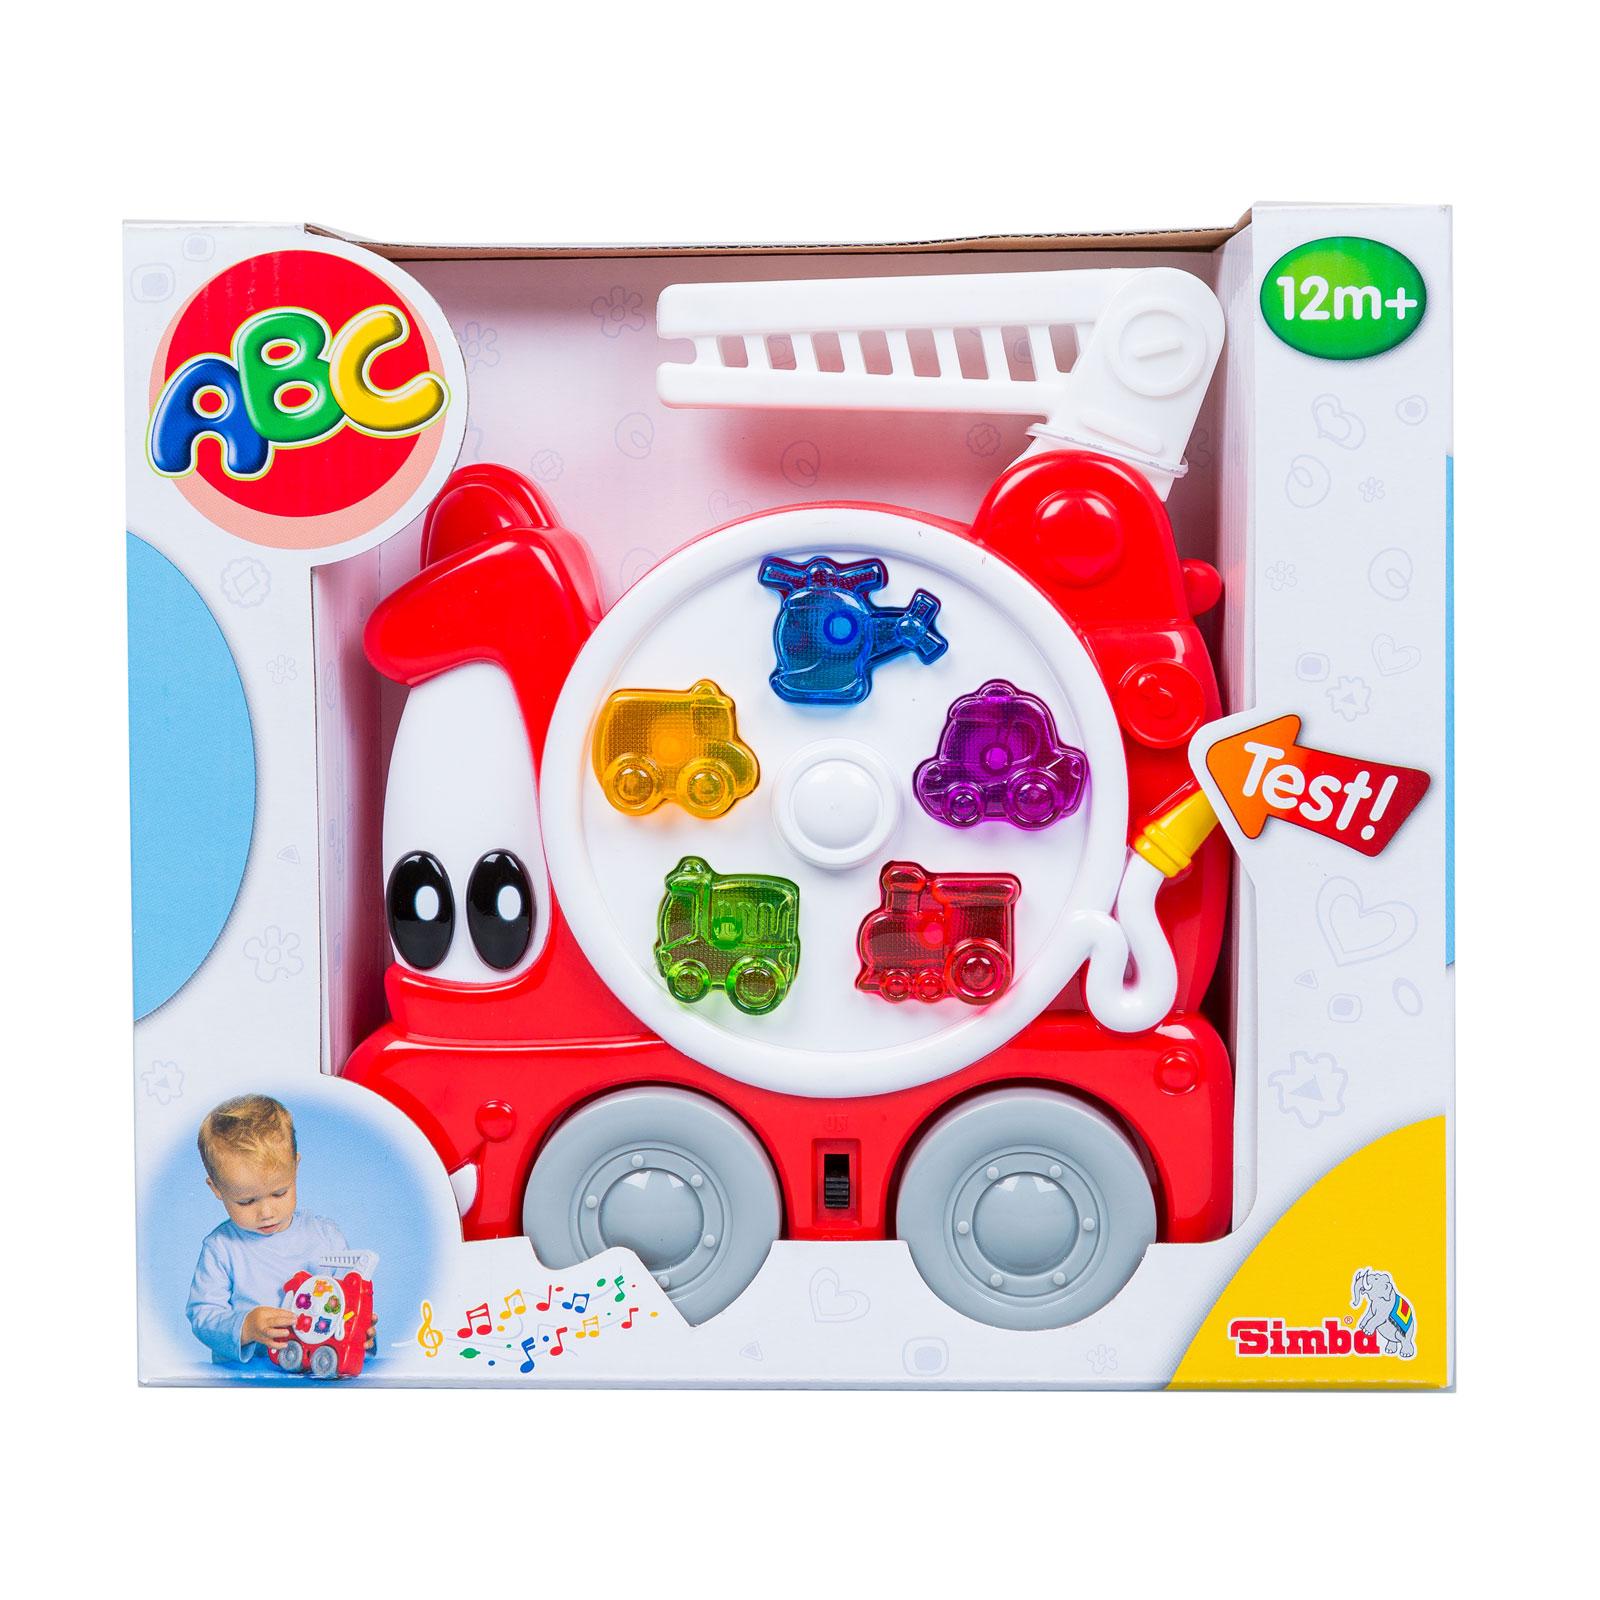 Музыкальная игрушка Simba Музыкальная игрушка Пожарная машина